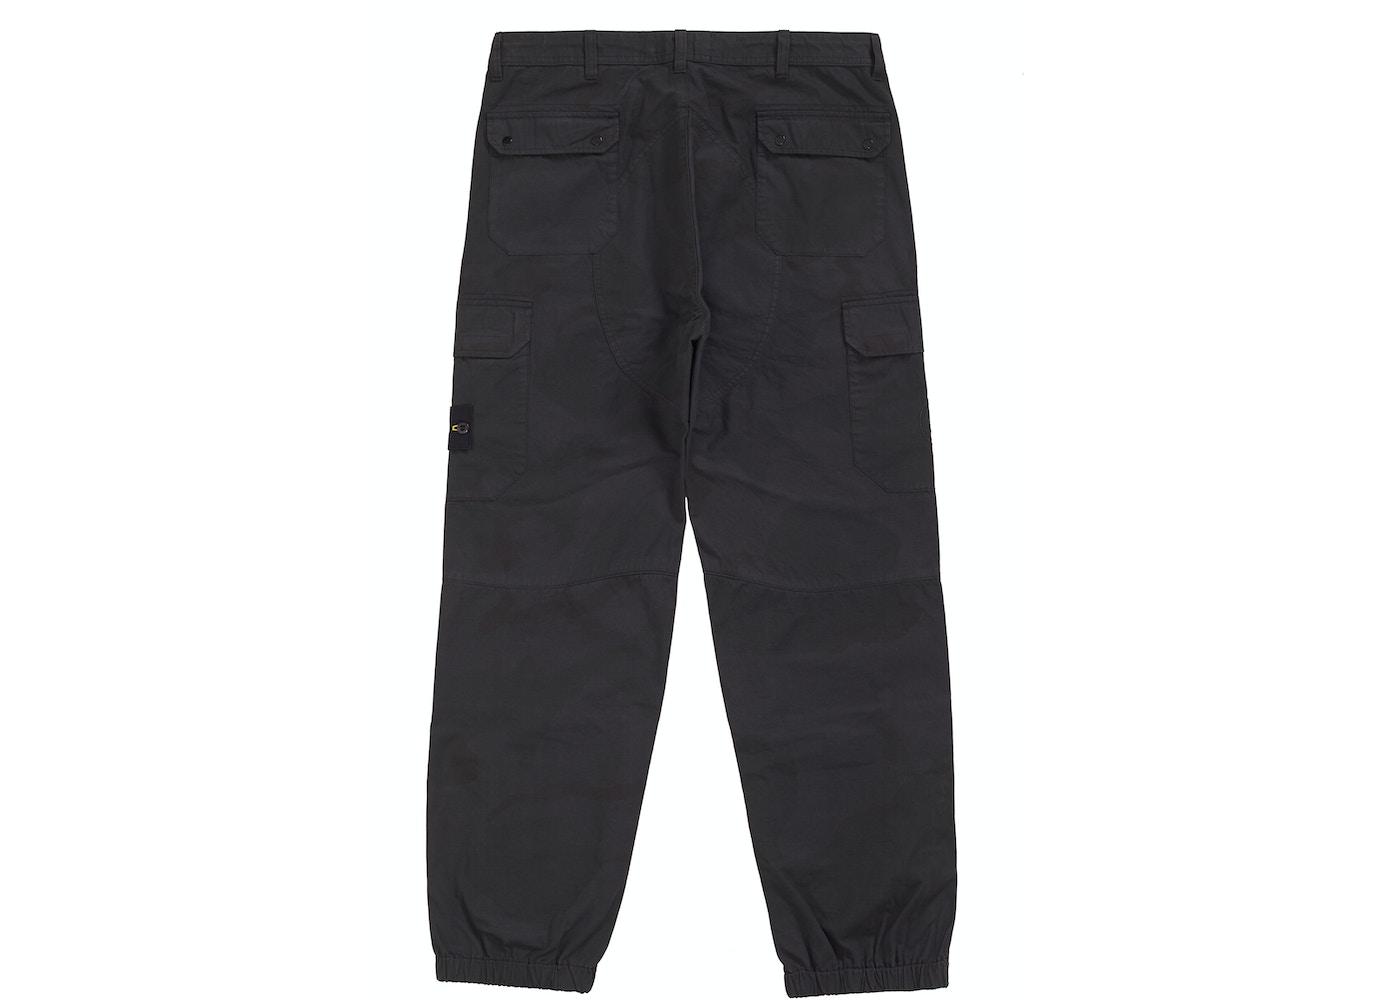 sale usa online exclusive deals cheap for sale Supreme Stone Island Camo Cargo Pant Black Camo